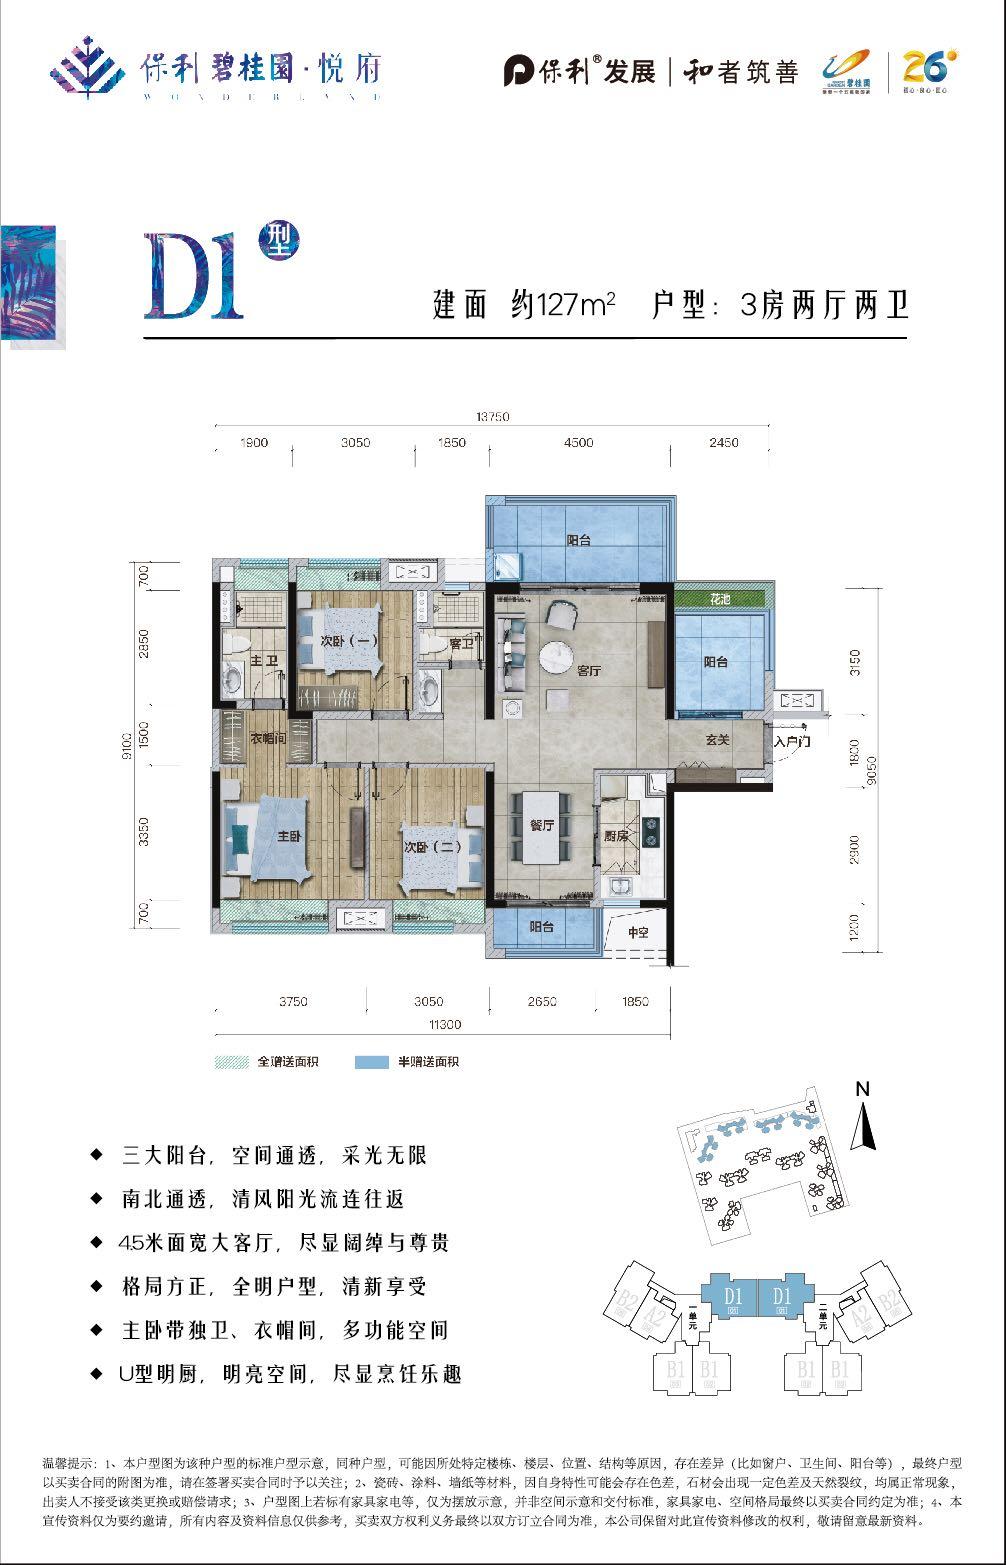 D1户型三房两厅两卫